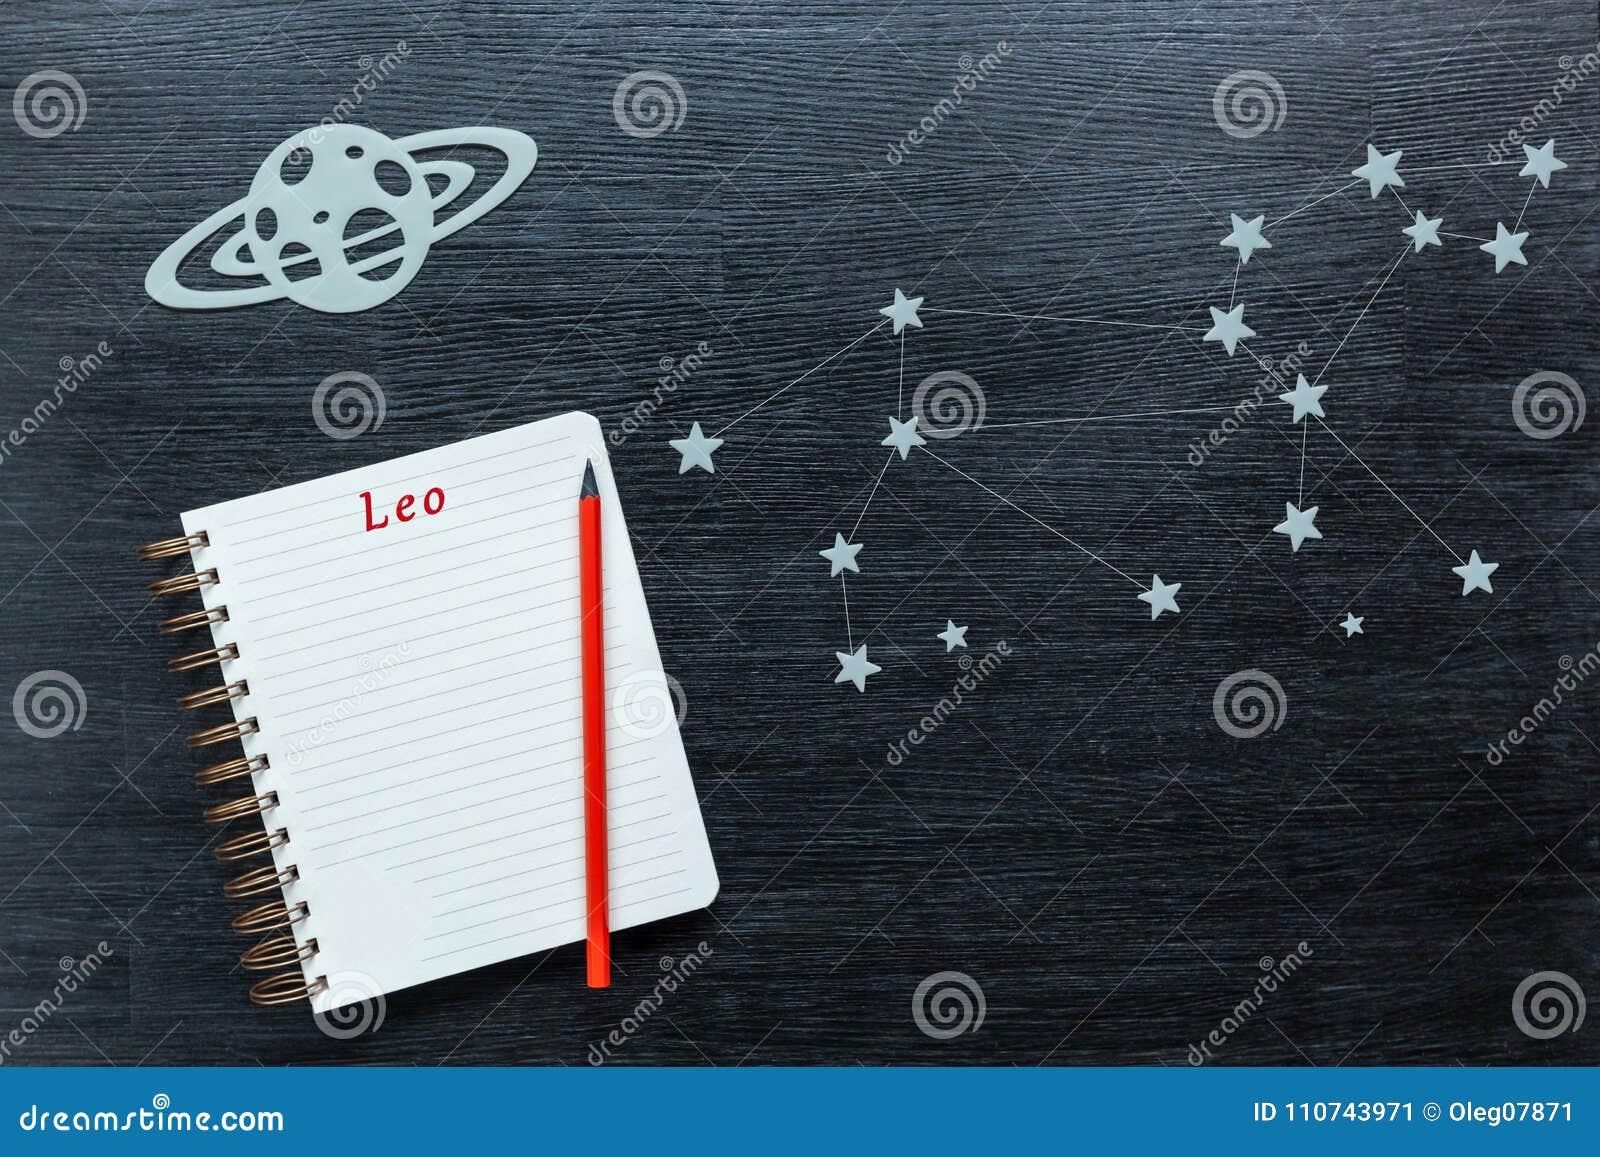 Constellations Leo